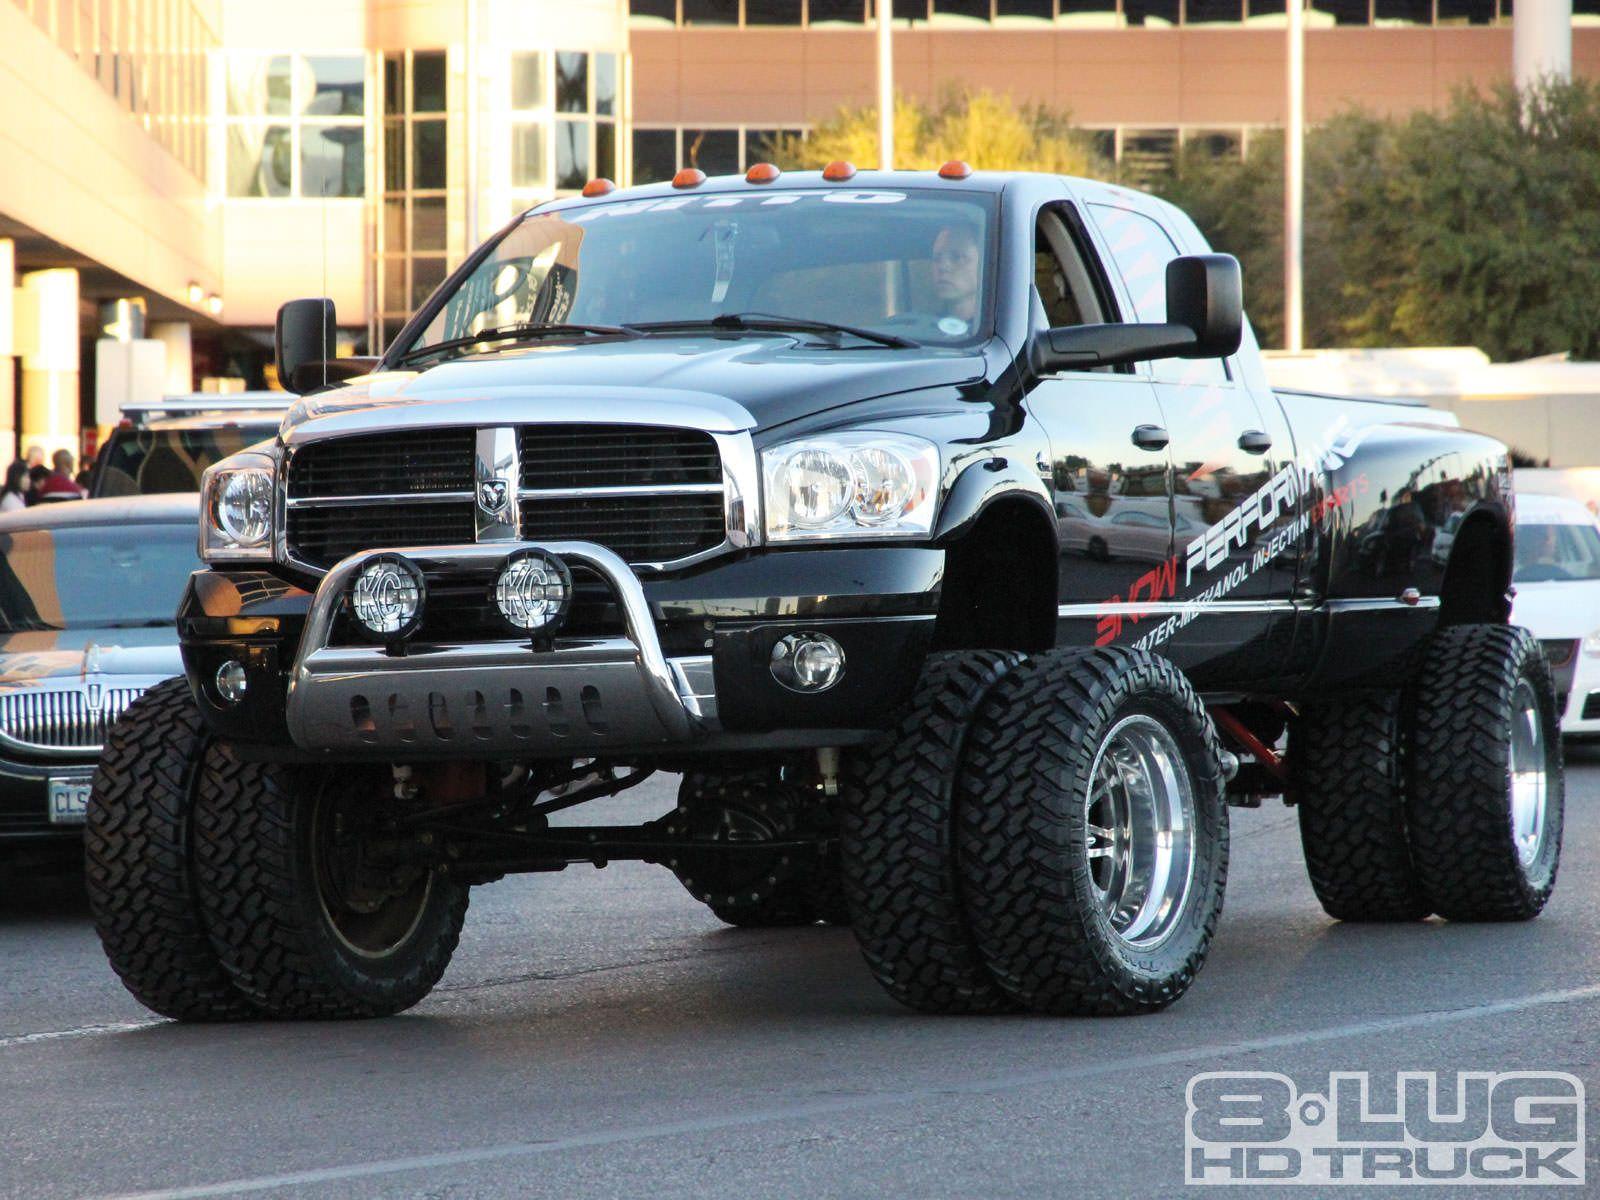 jacked up dually trucks - Google Search | EXOTICS | Pinterest ...